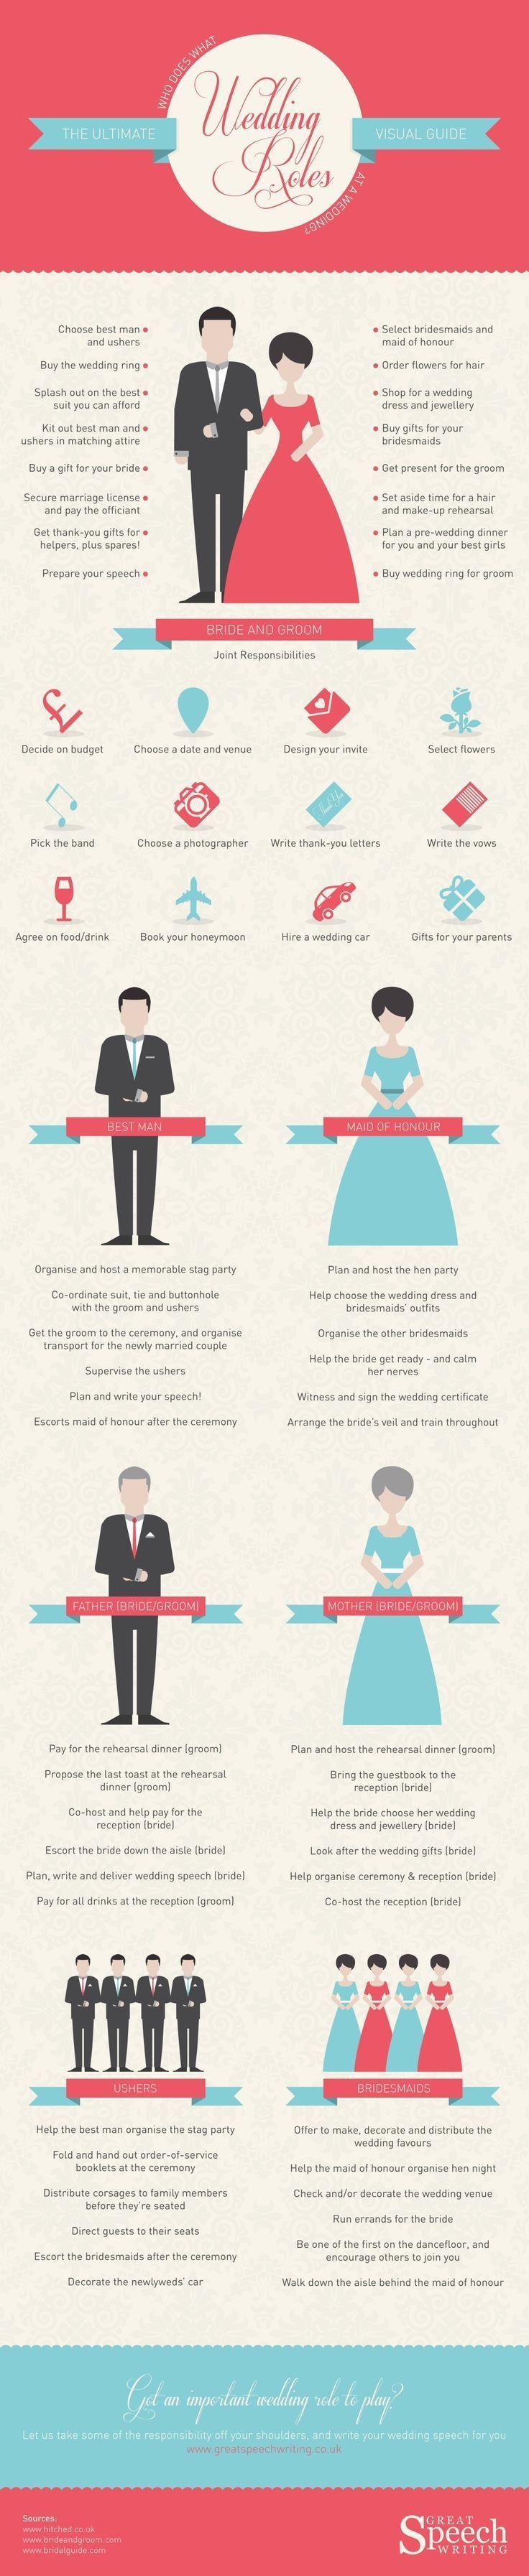 best Wedding Details images on Pinterest Weddings Receptions